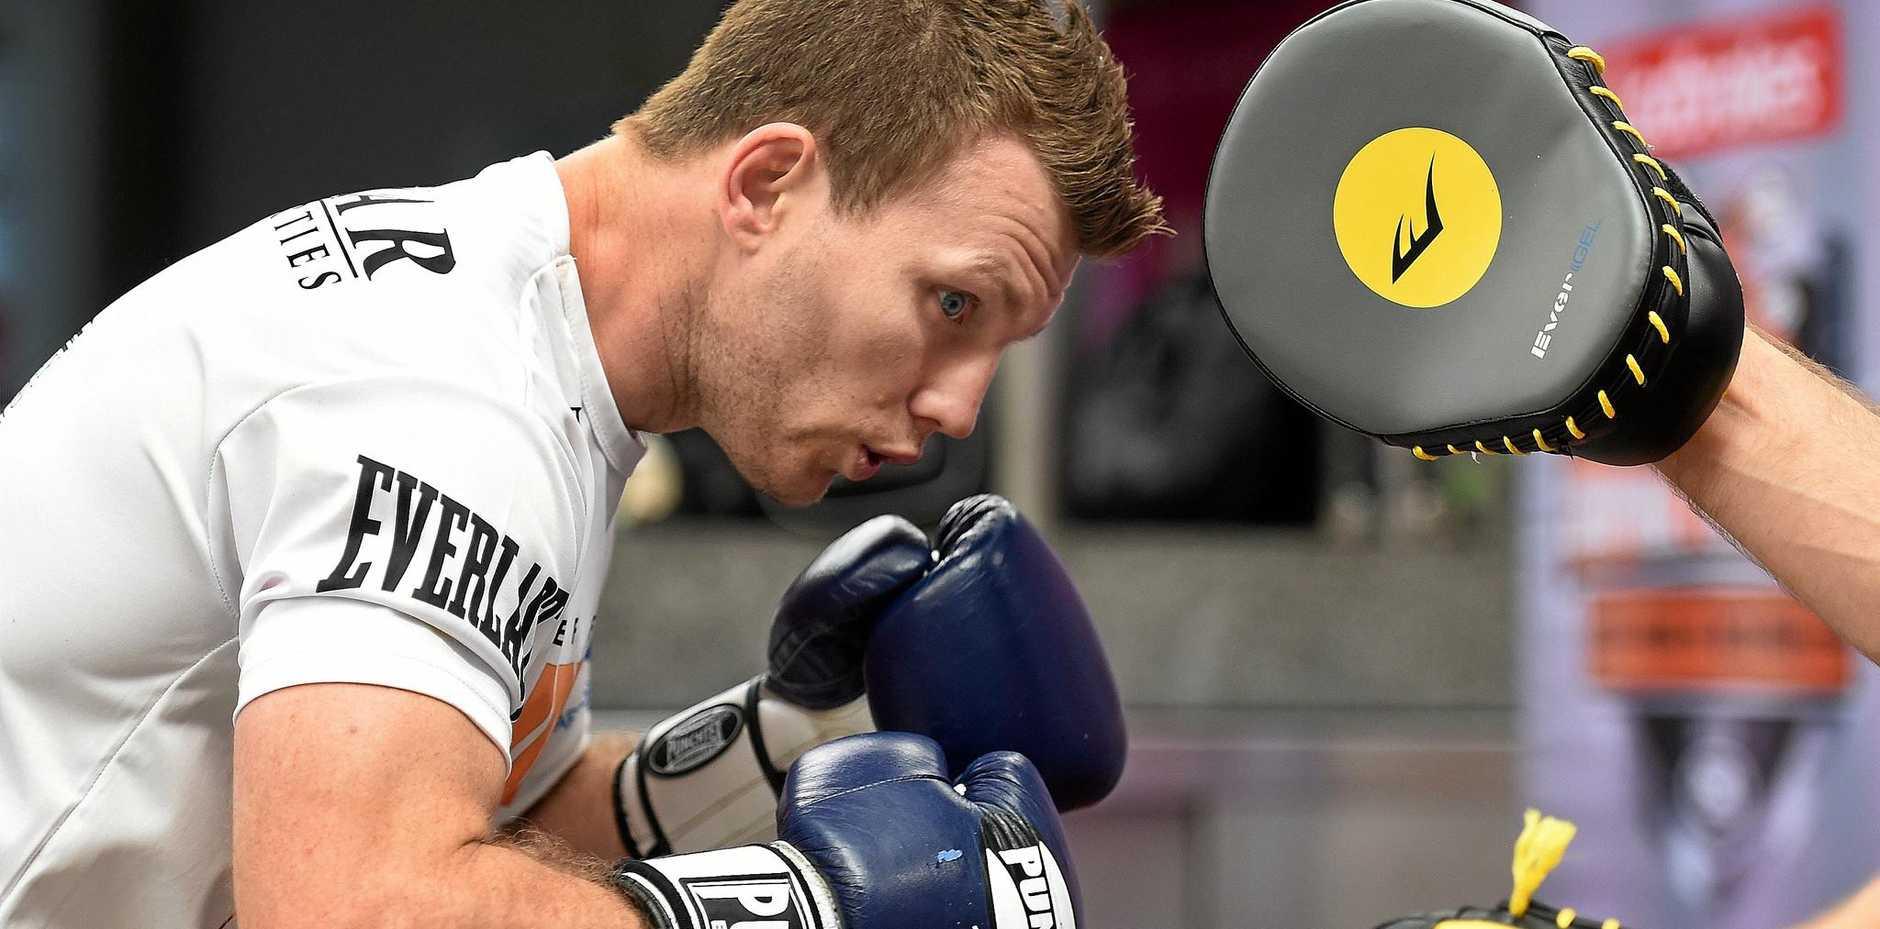 TOO POWERFUL: Former world champ John Mugabi says Australia's Jeff Horn will shock Manny Pacquaio with his strength.